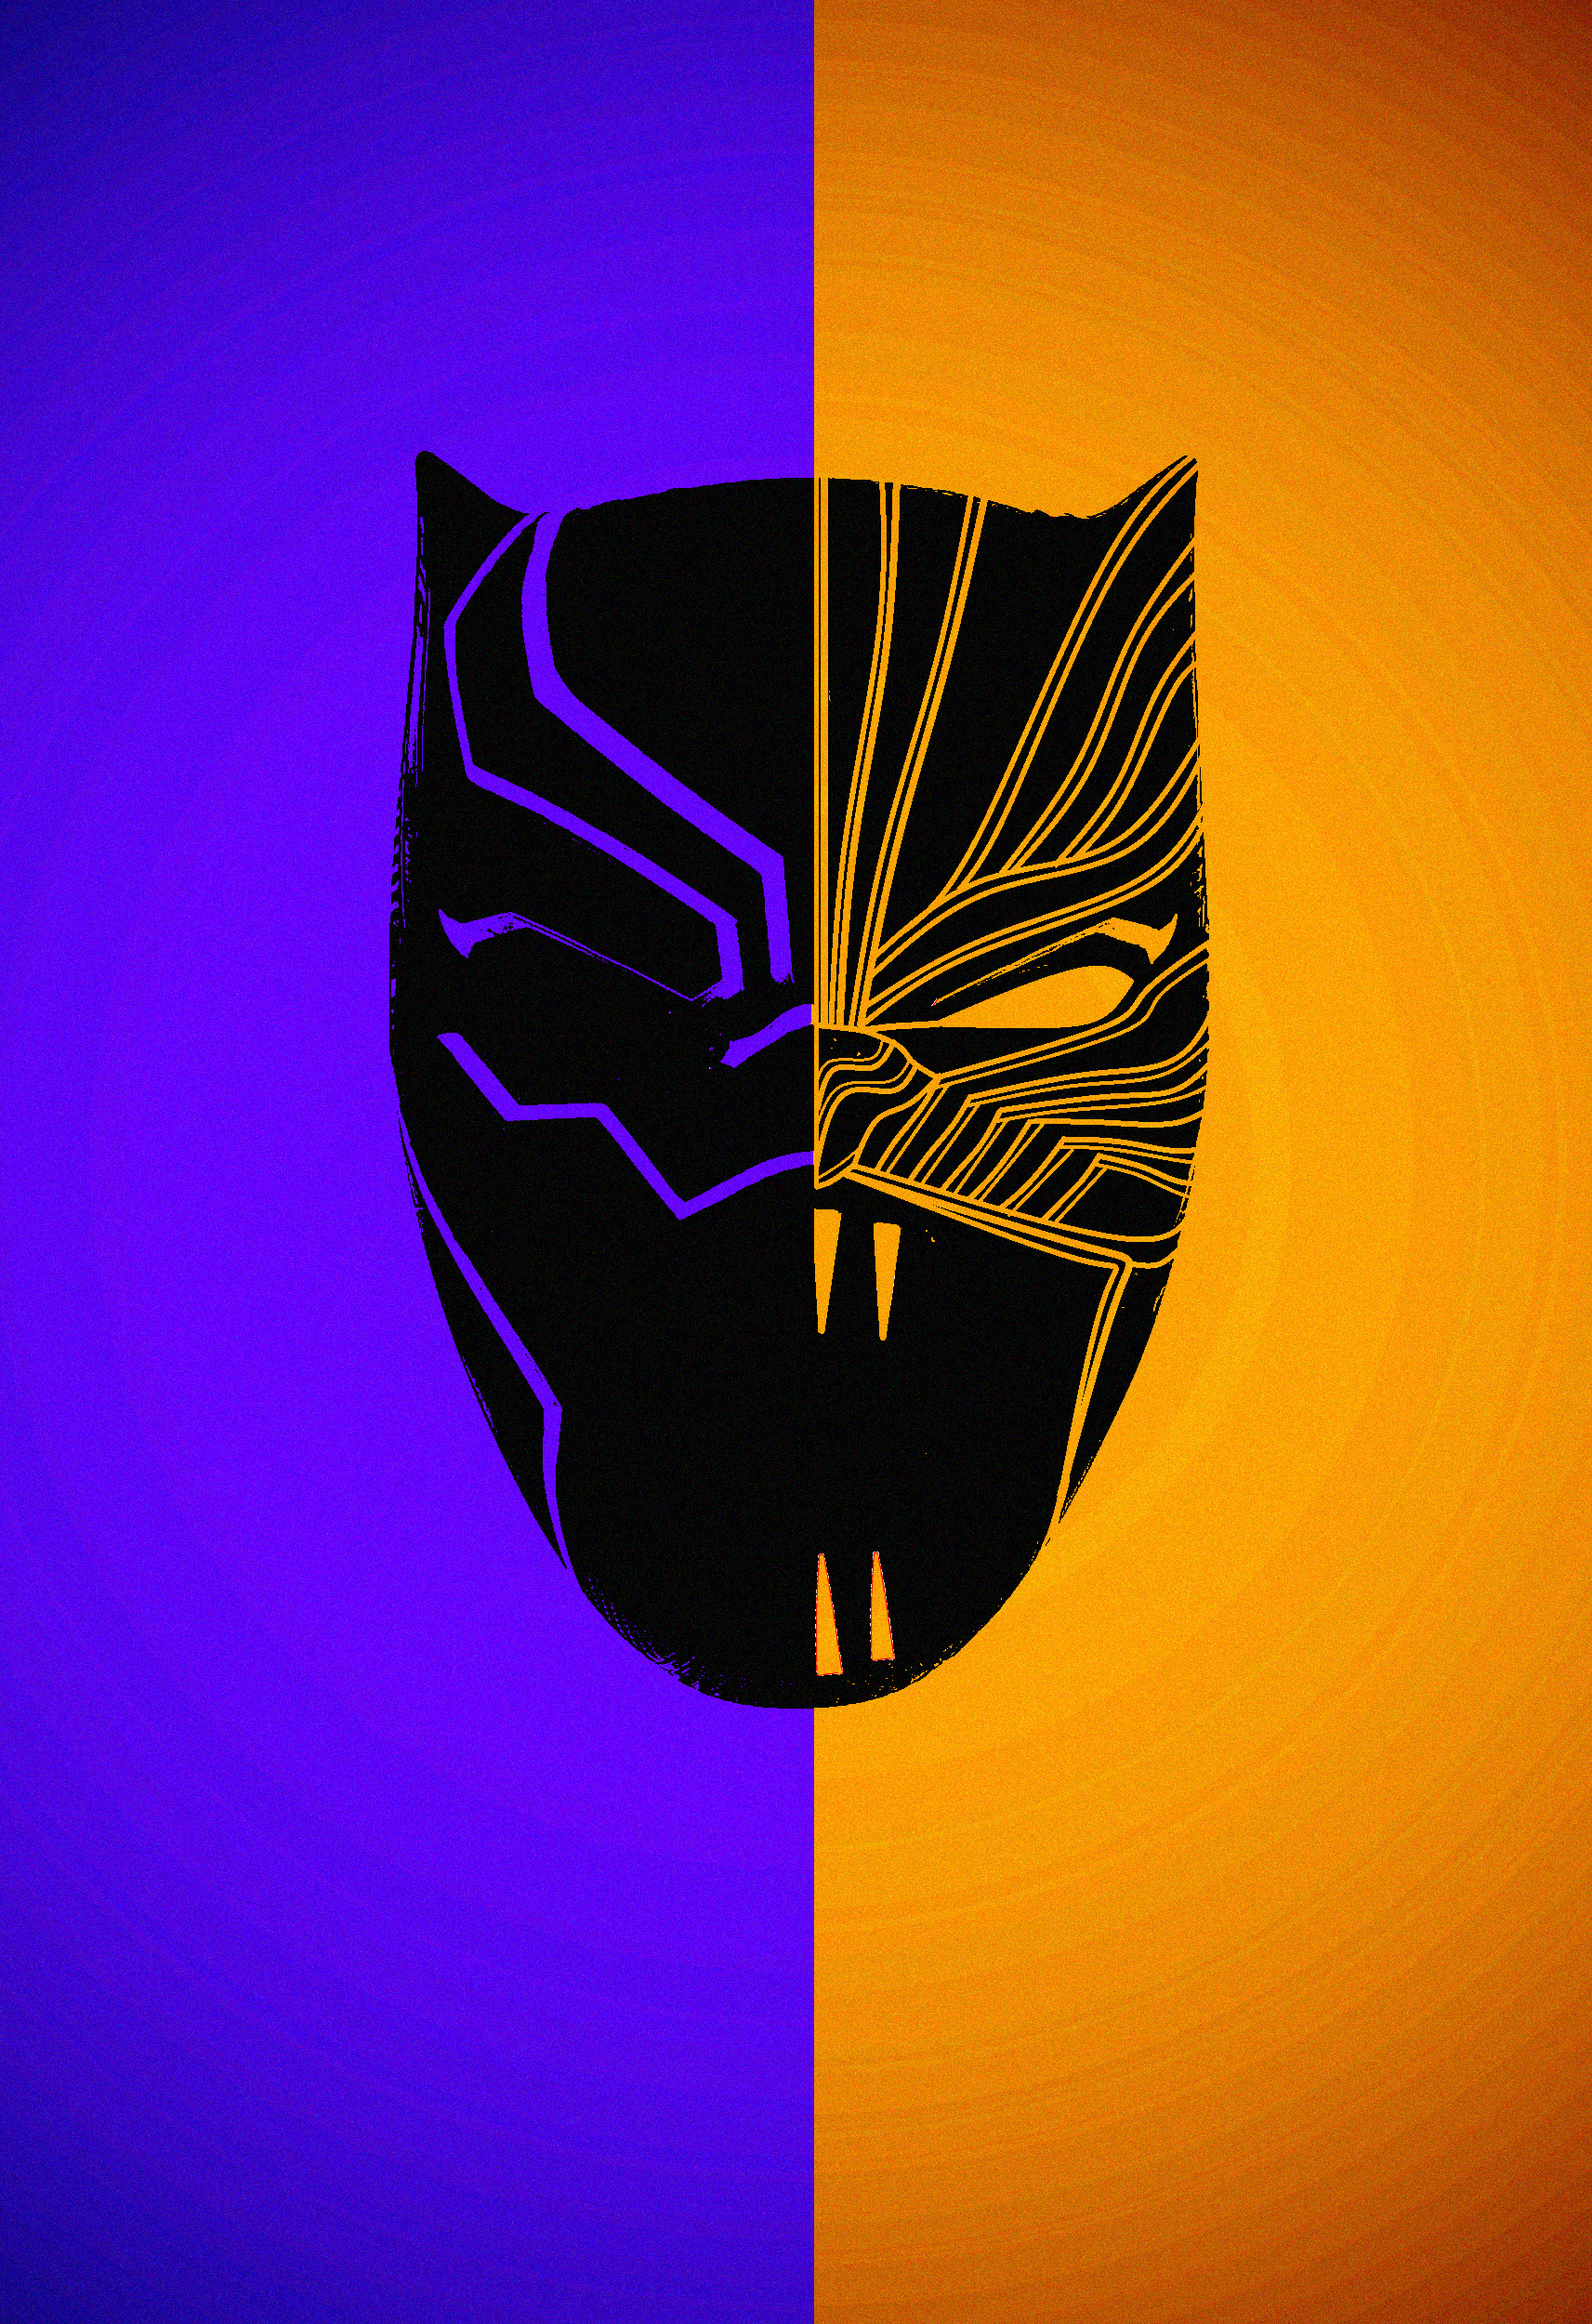 Golden Black Panther Wallpaper Download Wallpaper 1713x2500